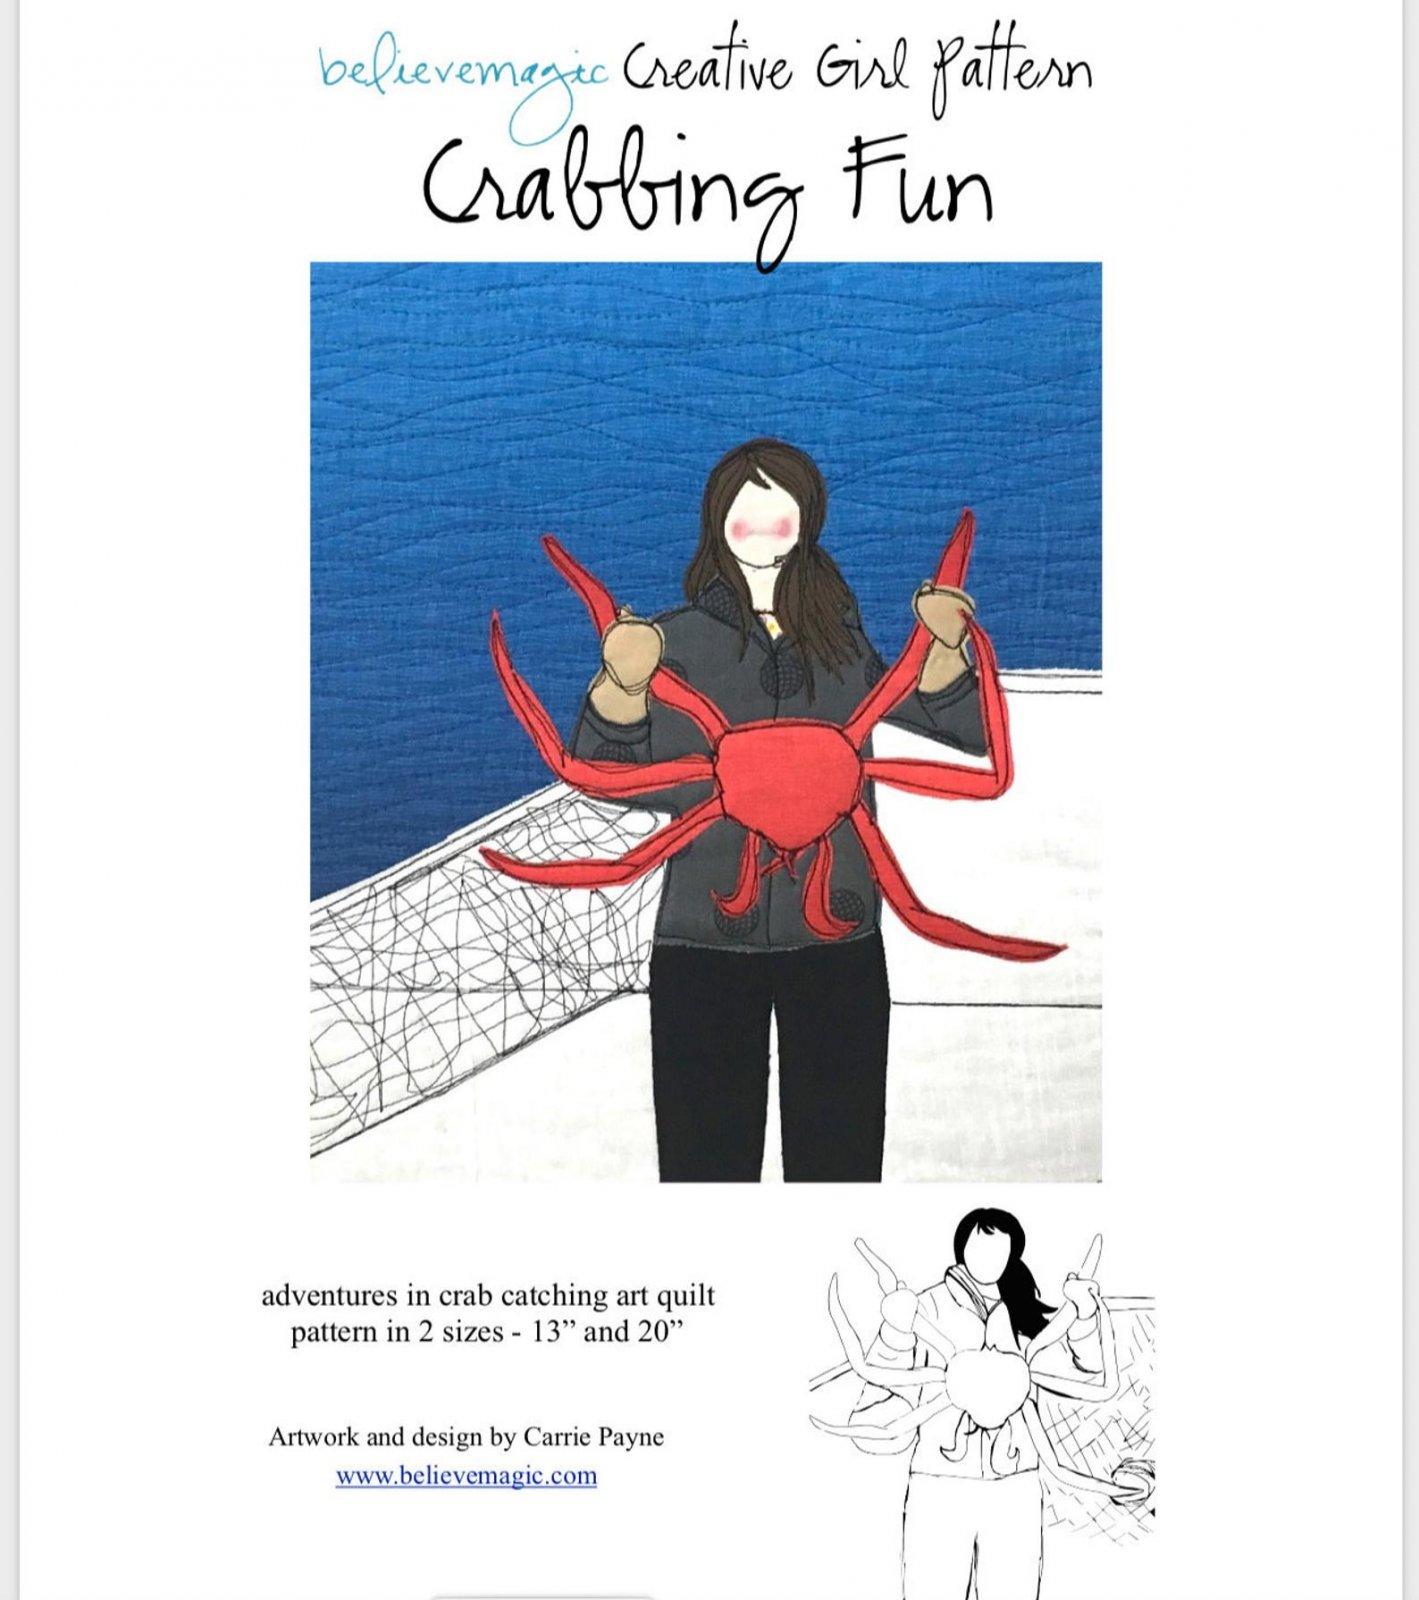 Crabbing Fun